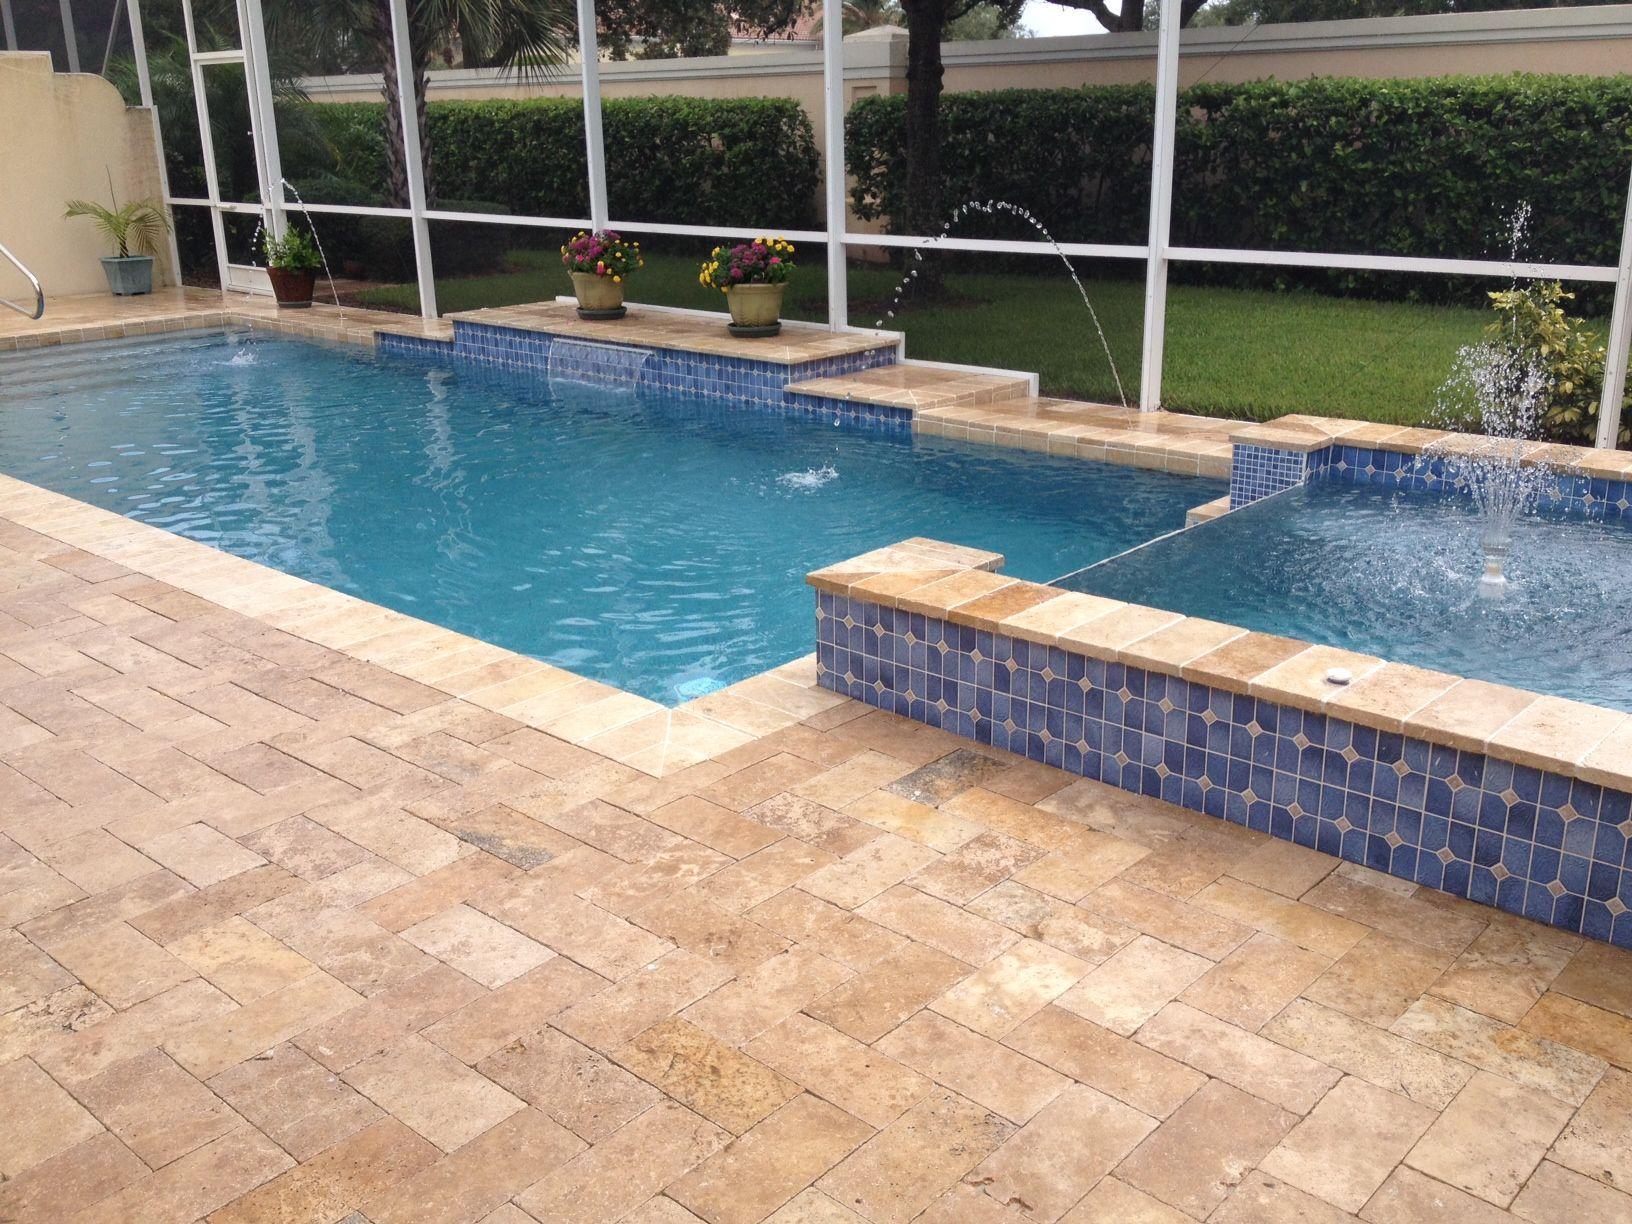 Travertine Pool Deck Deck Designs Ideas Pool Deck